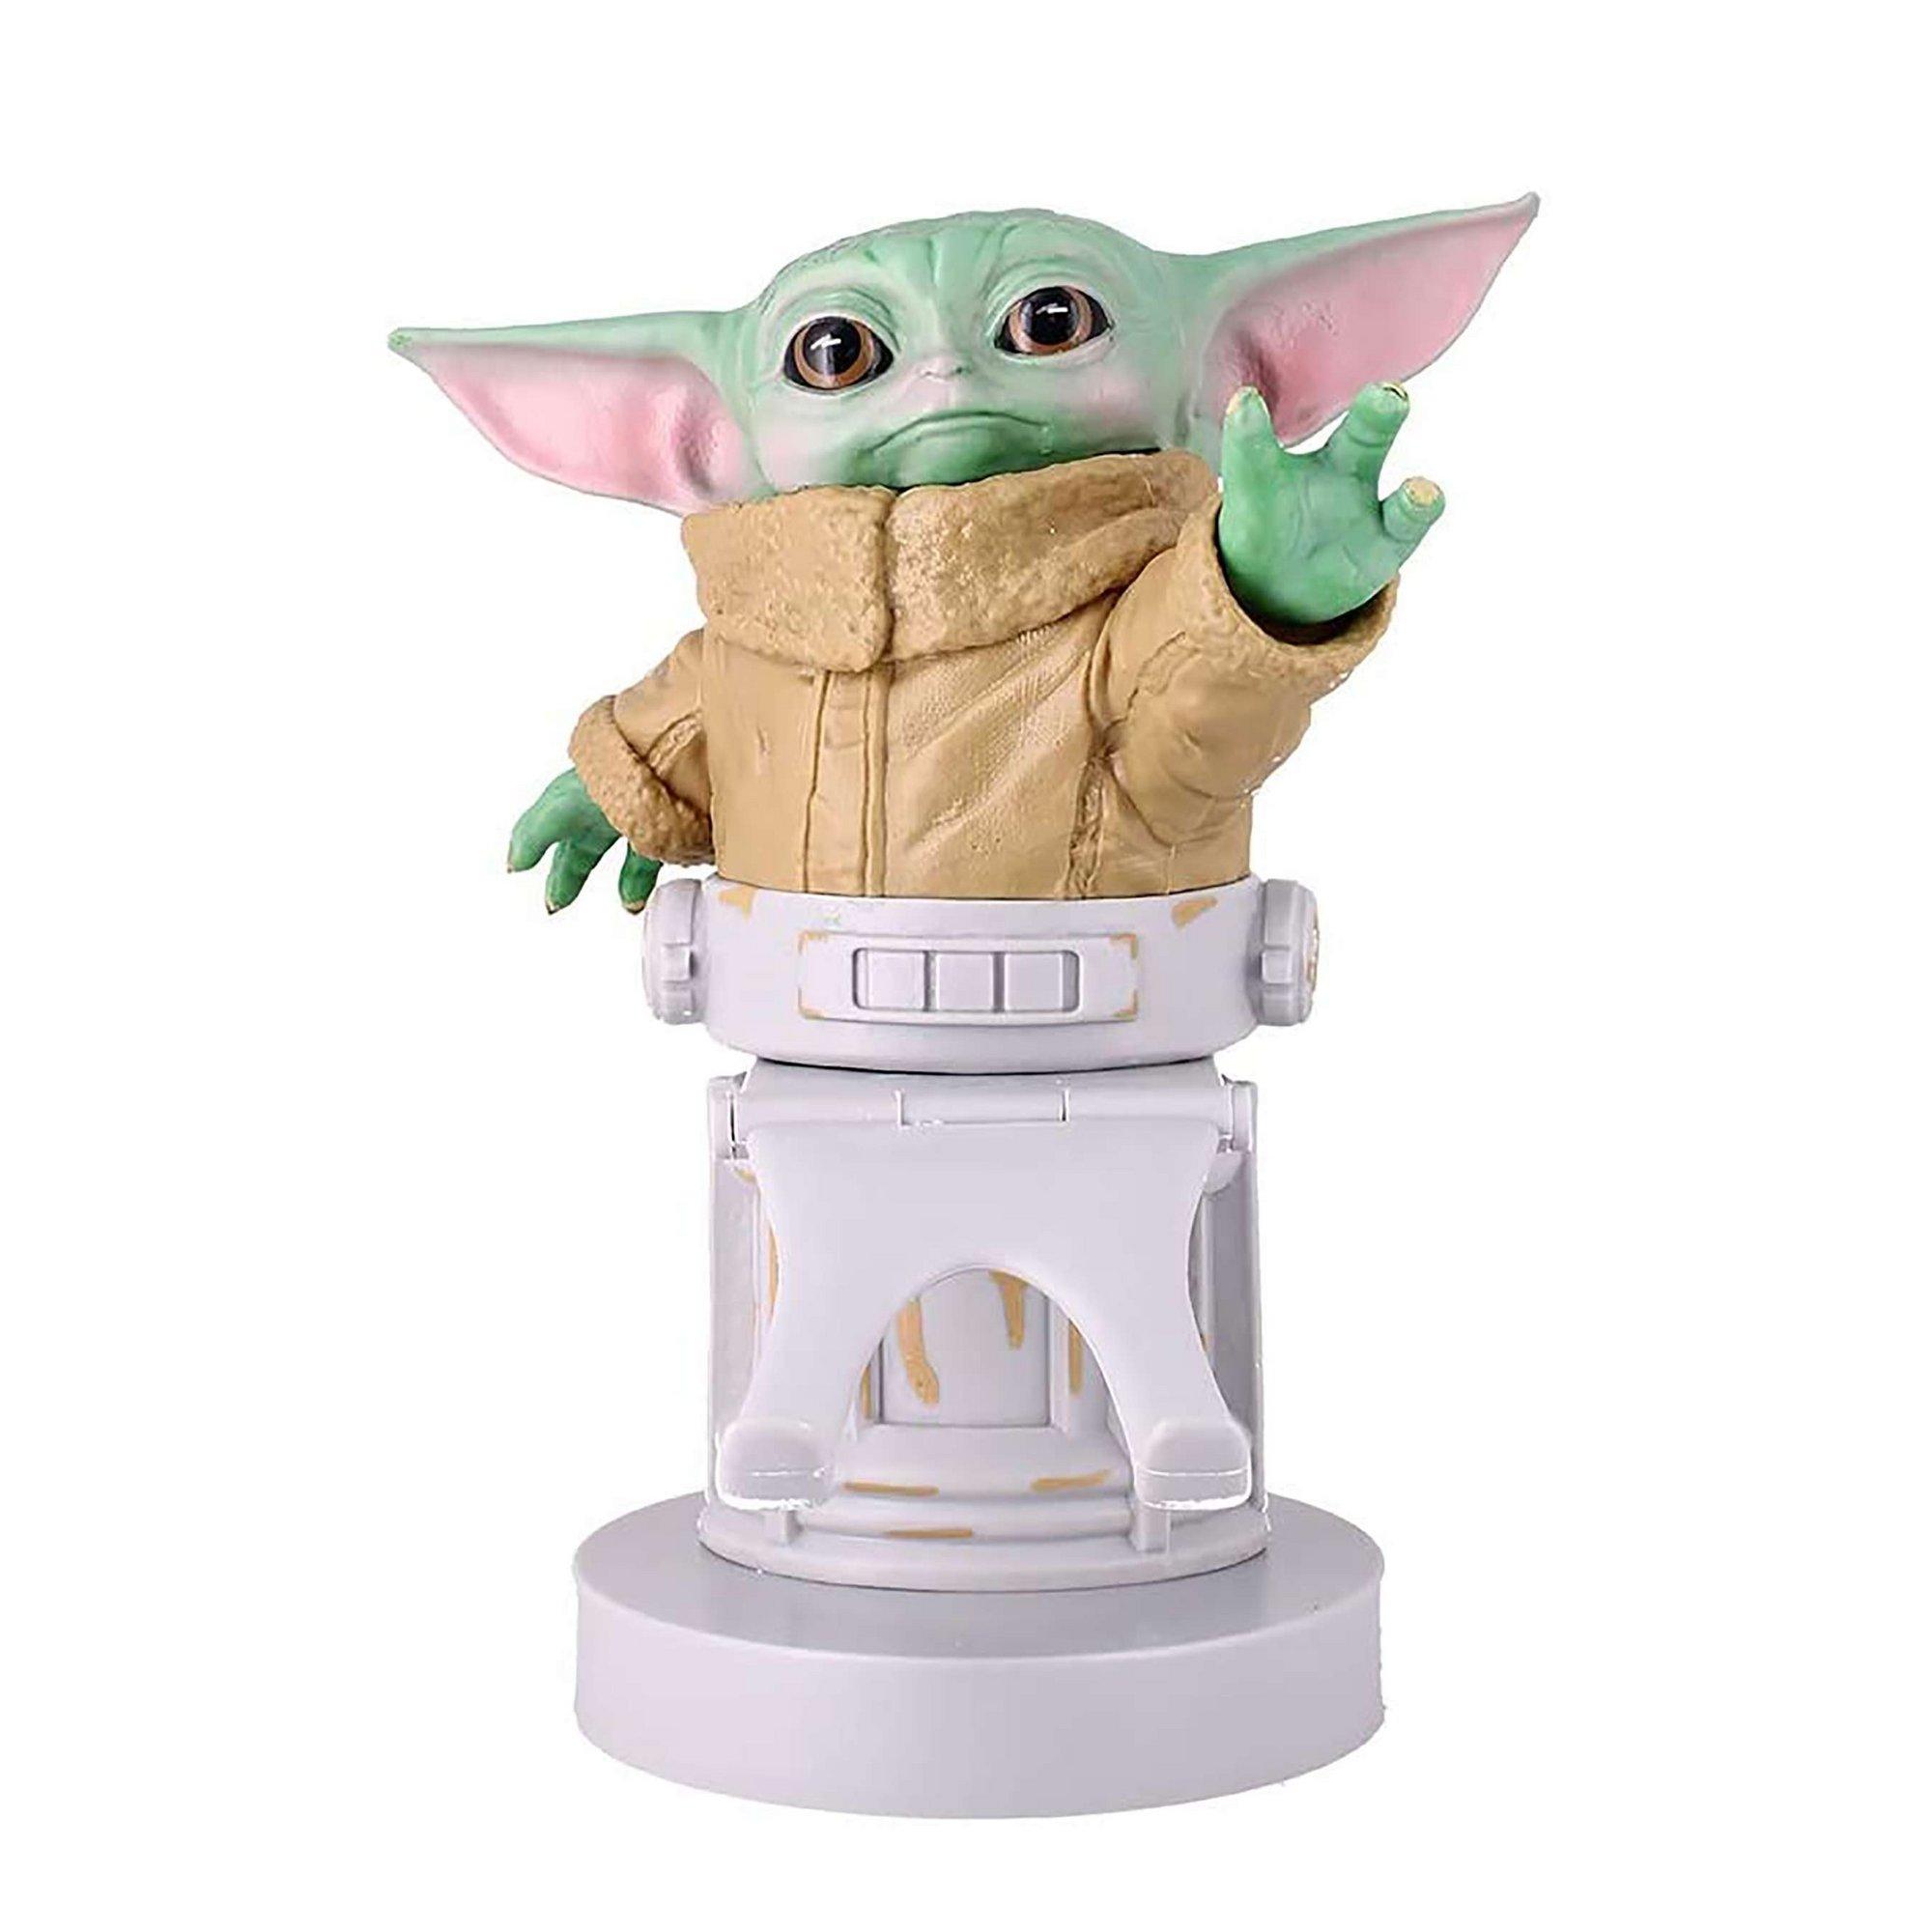 Image of CG SW The Child: Baby Yoda Holder